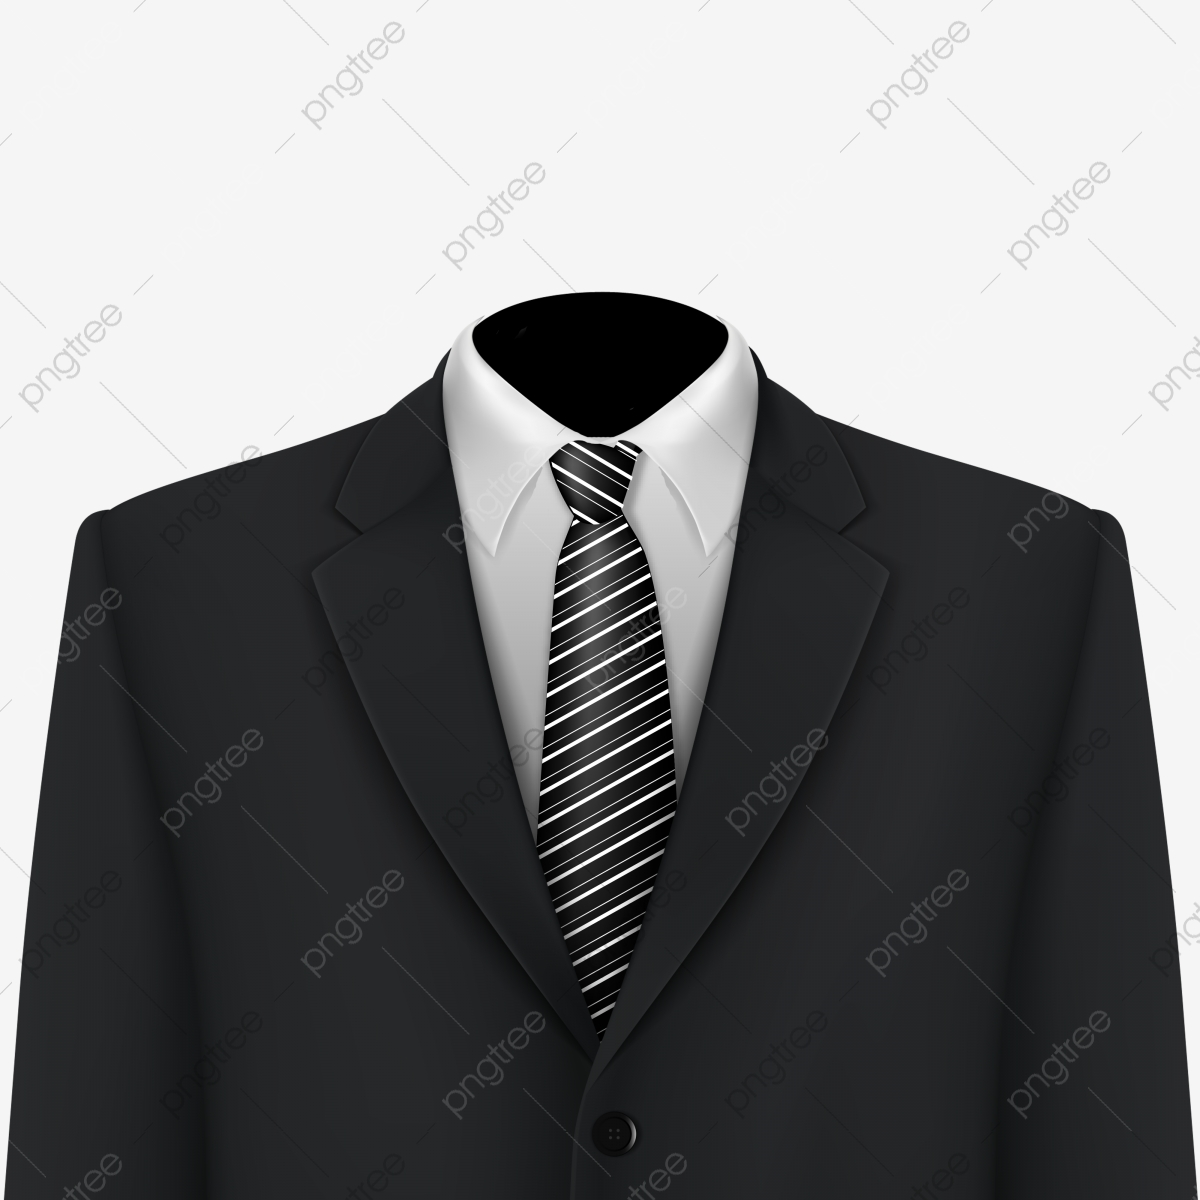 Tuxedo Bridegroom Suit Wedding Dress - Tuxedo Png Clipart (#142316) -  PinClipart